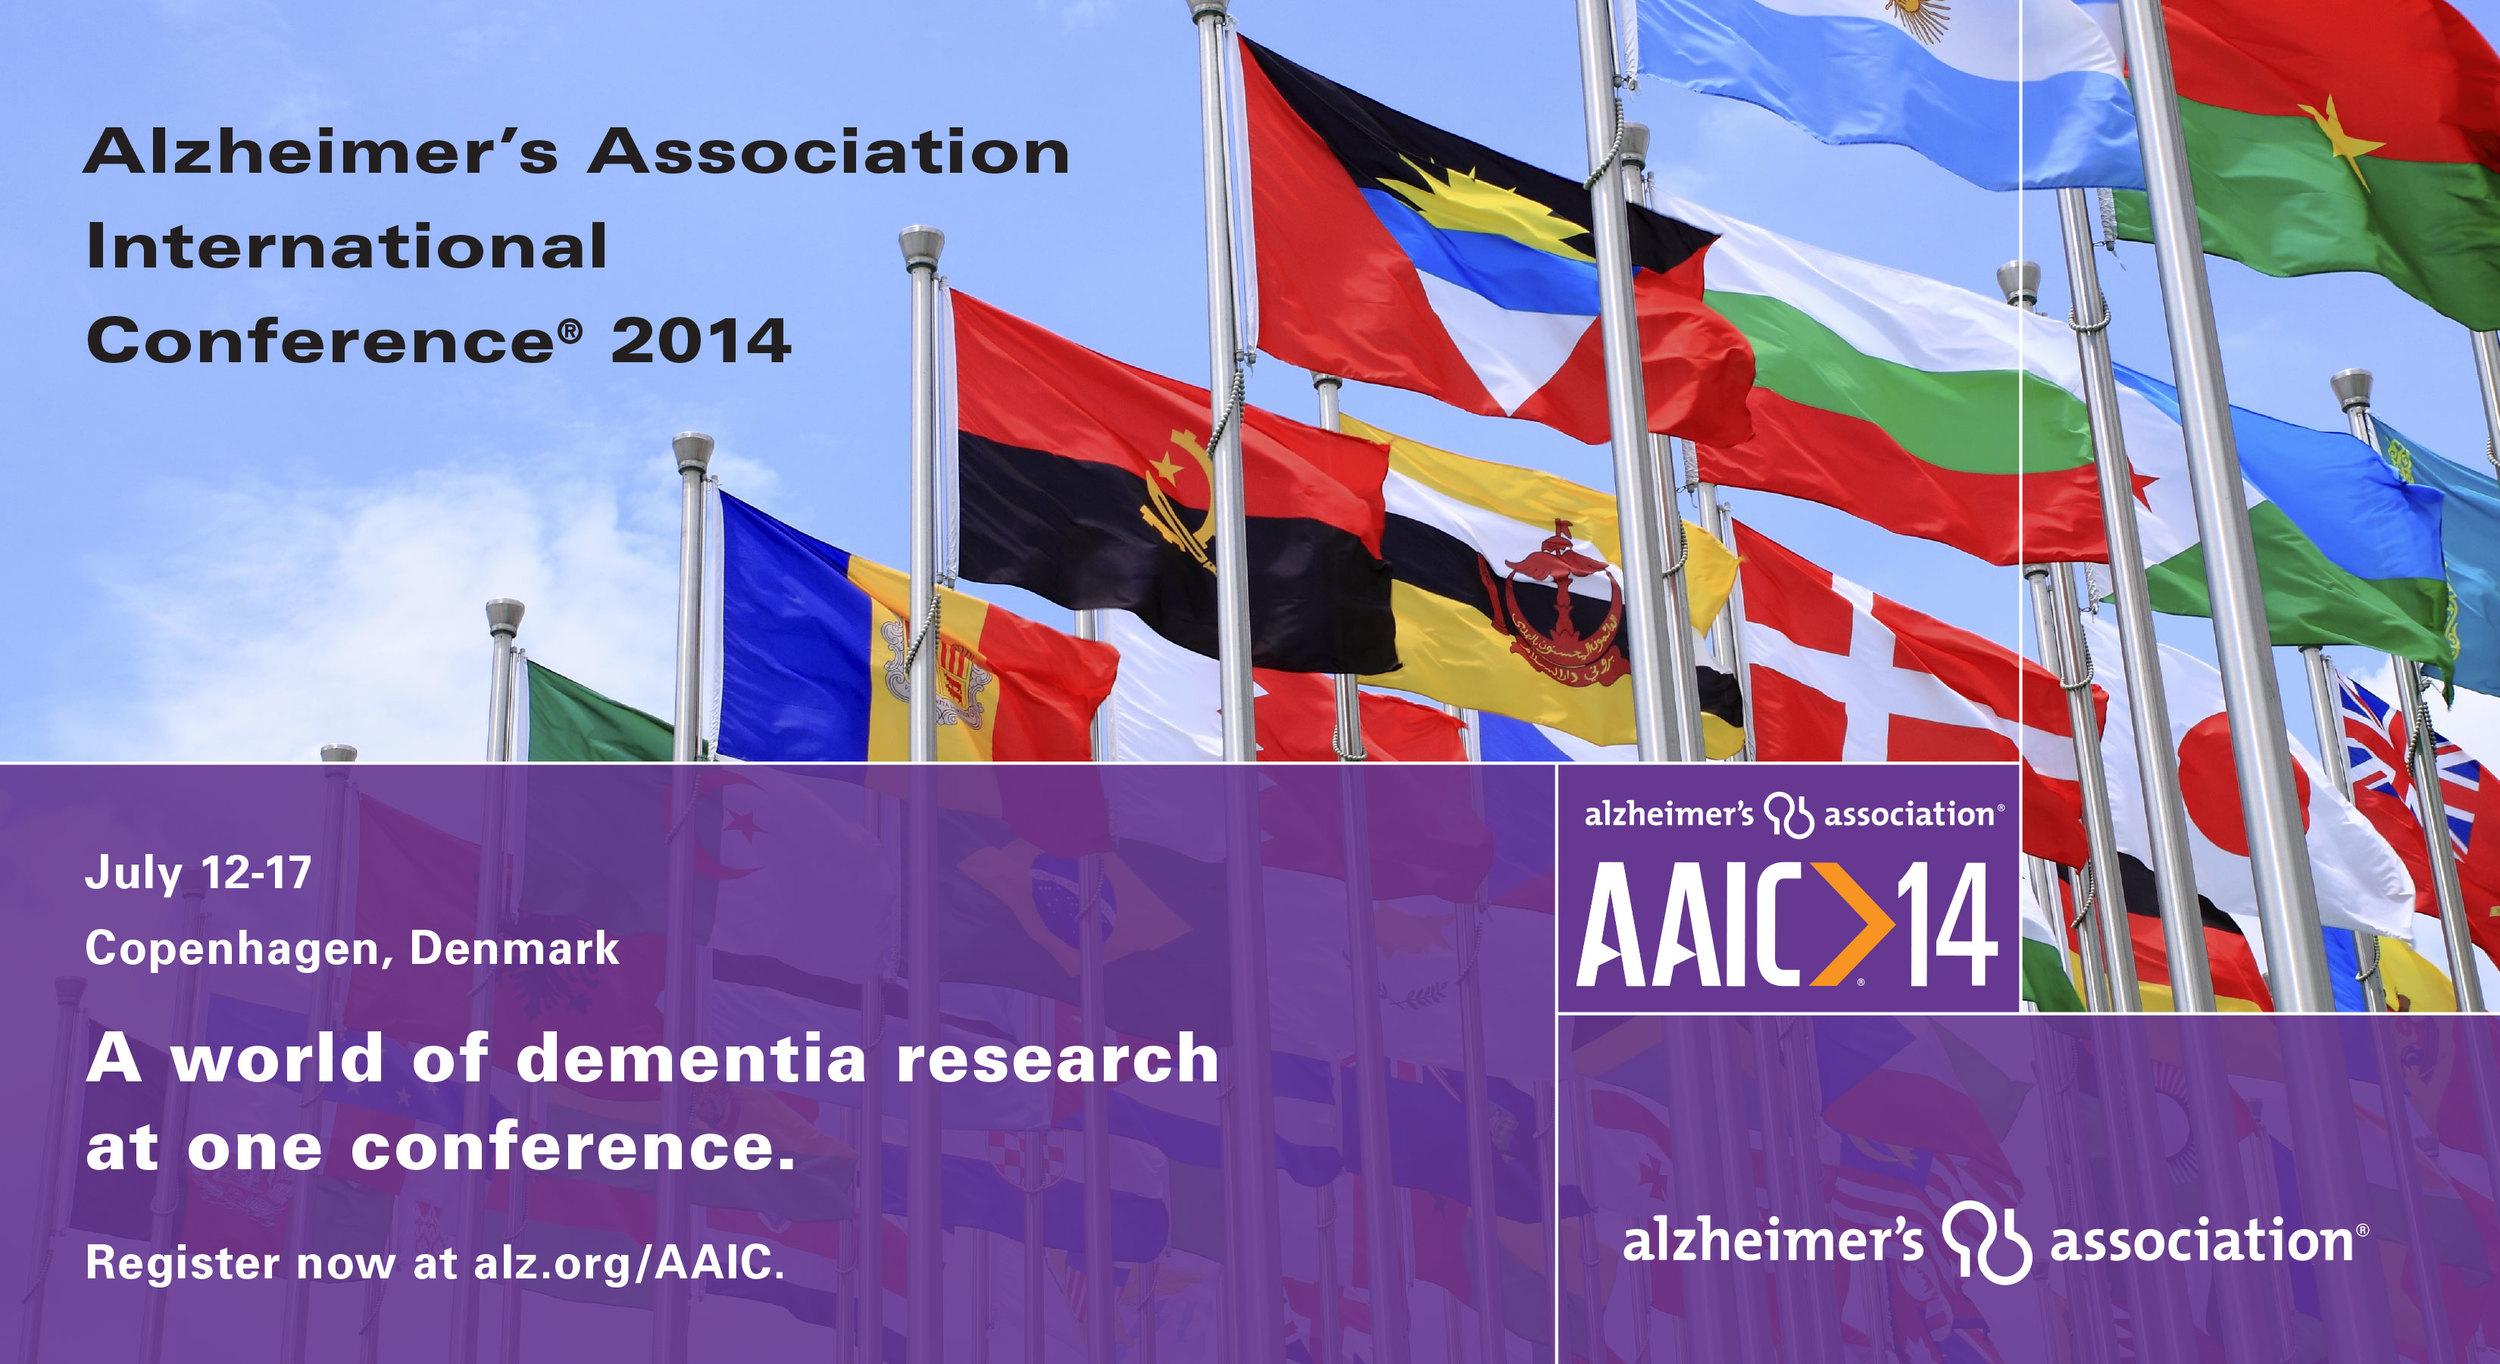 AAIC14 REGISTRATION REMINDER POSTCARD